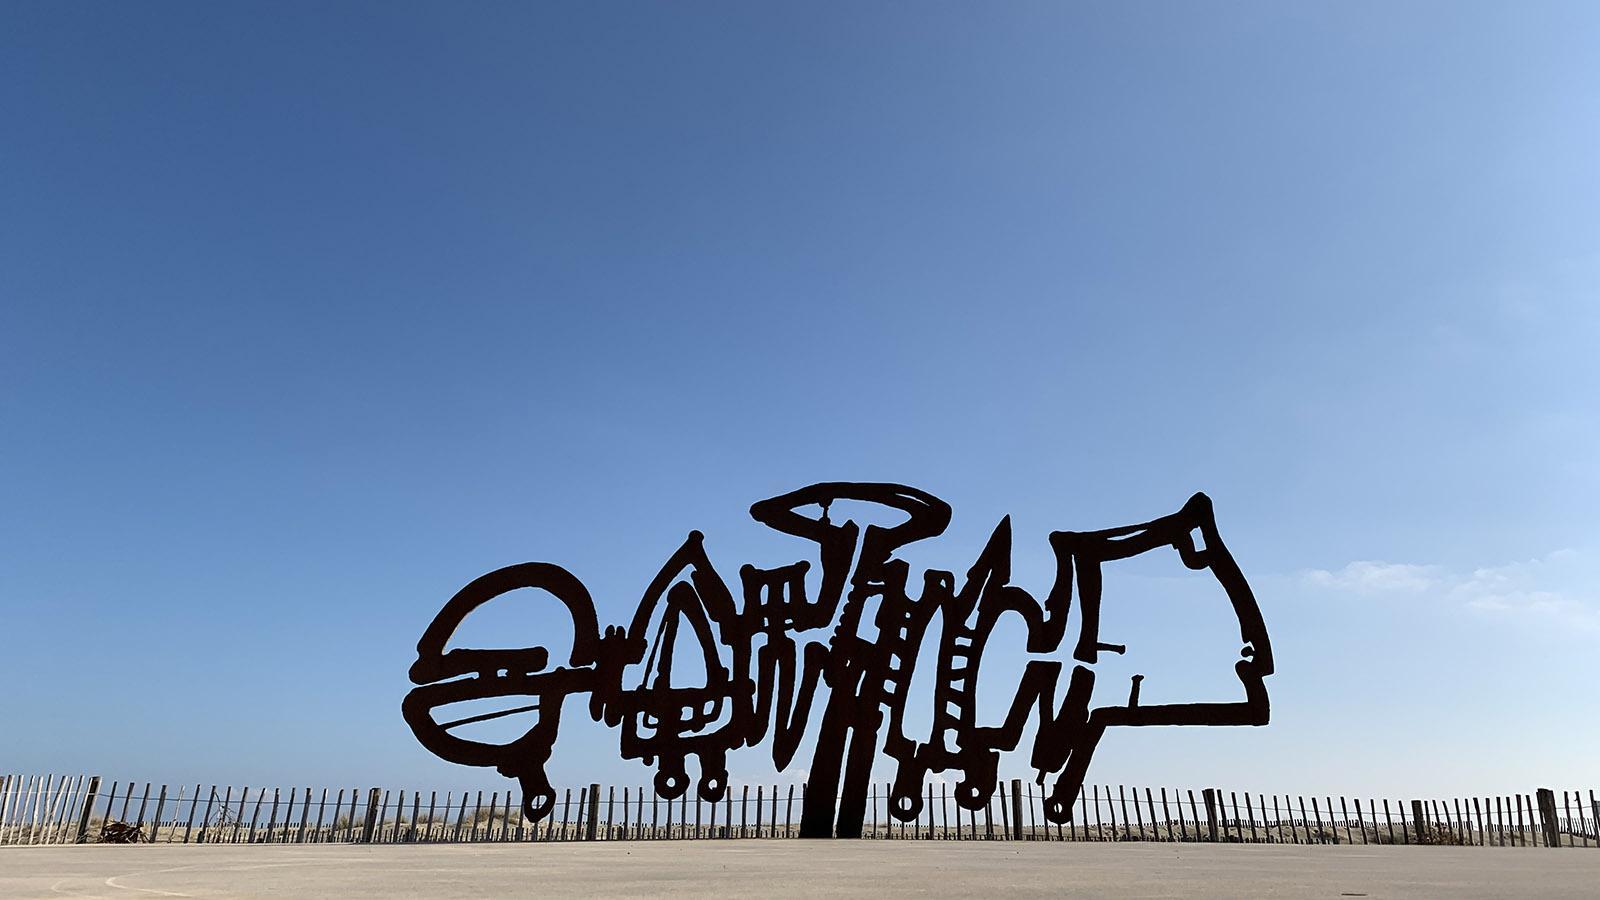 Floride française: Skulptur von Patrick Chappert-Gaujal an der Promenade von Port-Barcarès. Foto: Hilke Maunder